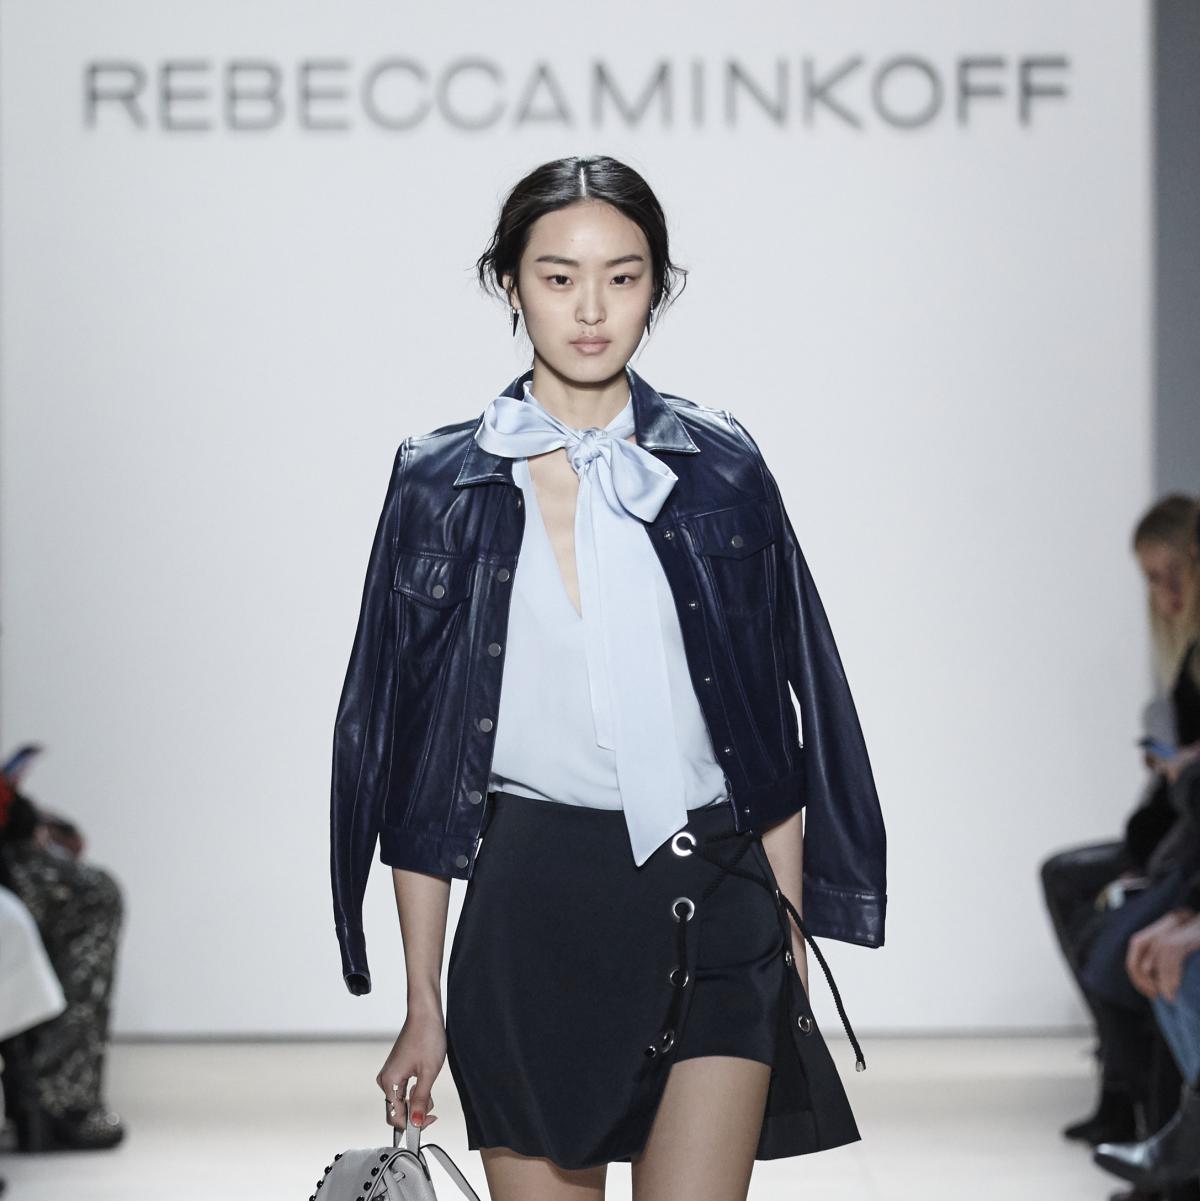 Rebecca Minkoff Look 21